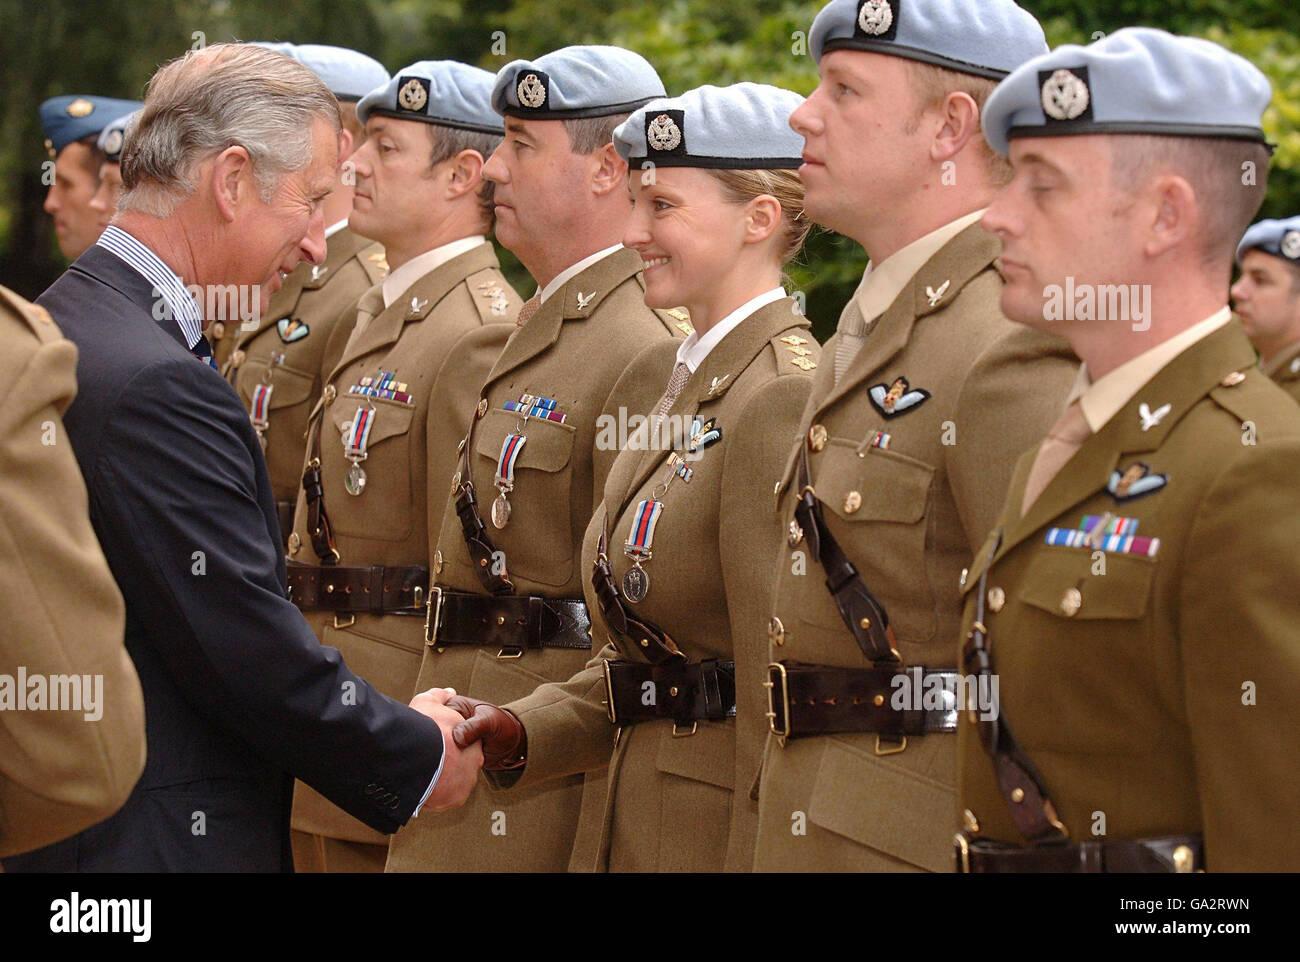 Prince Of Wales OP Herrick Medal Presentation Stock Photo - Alamy